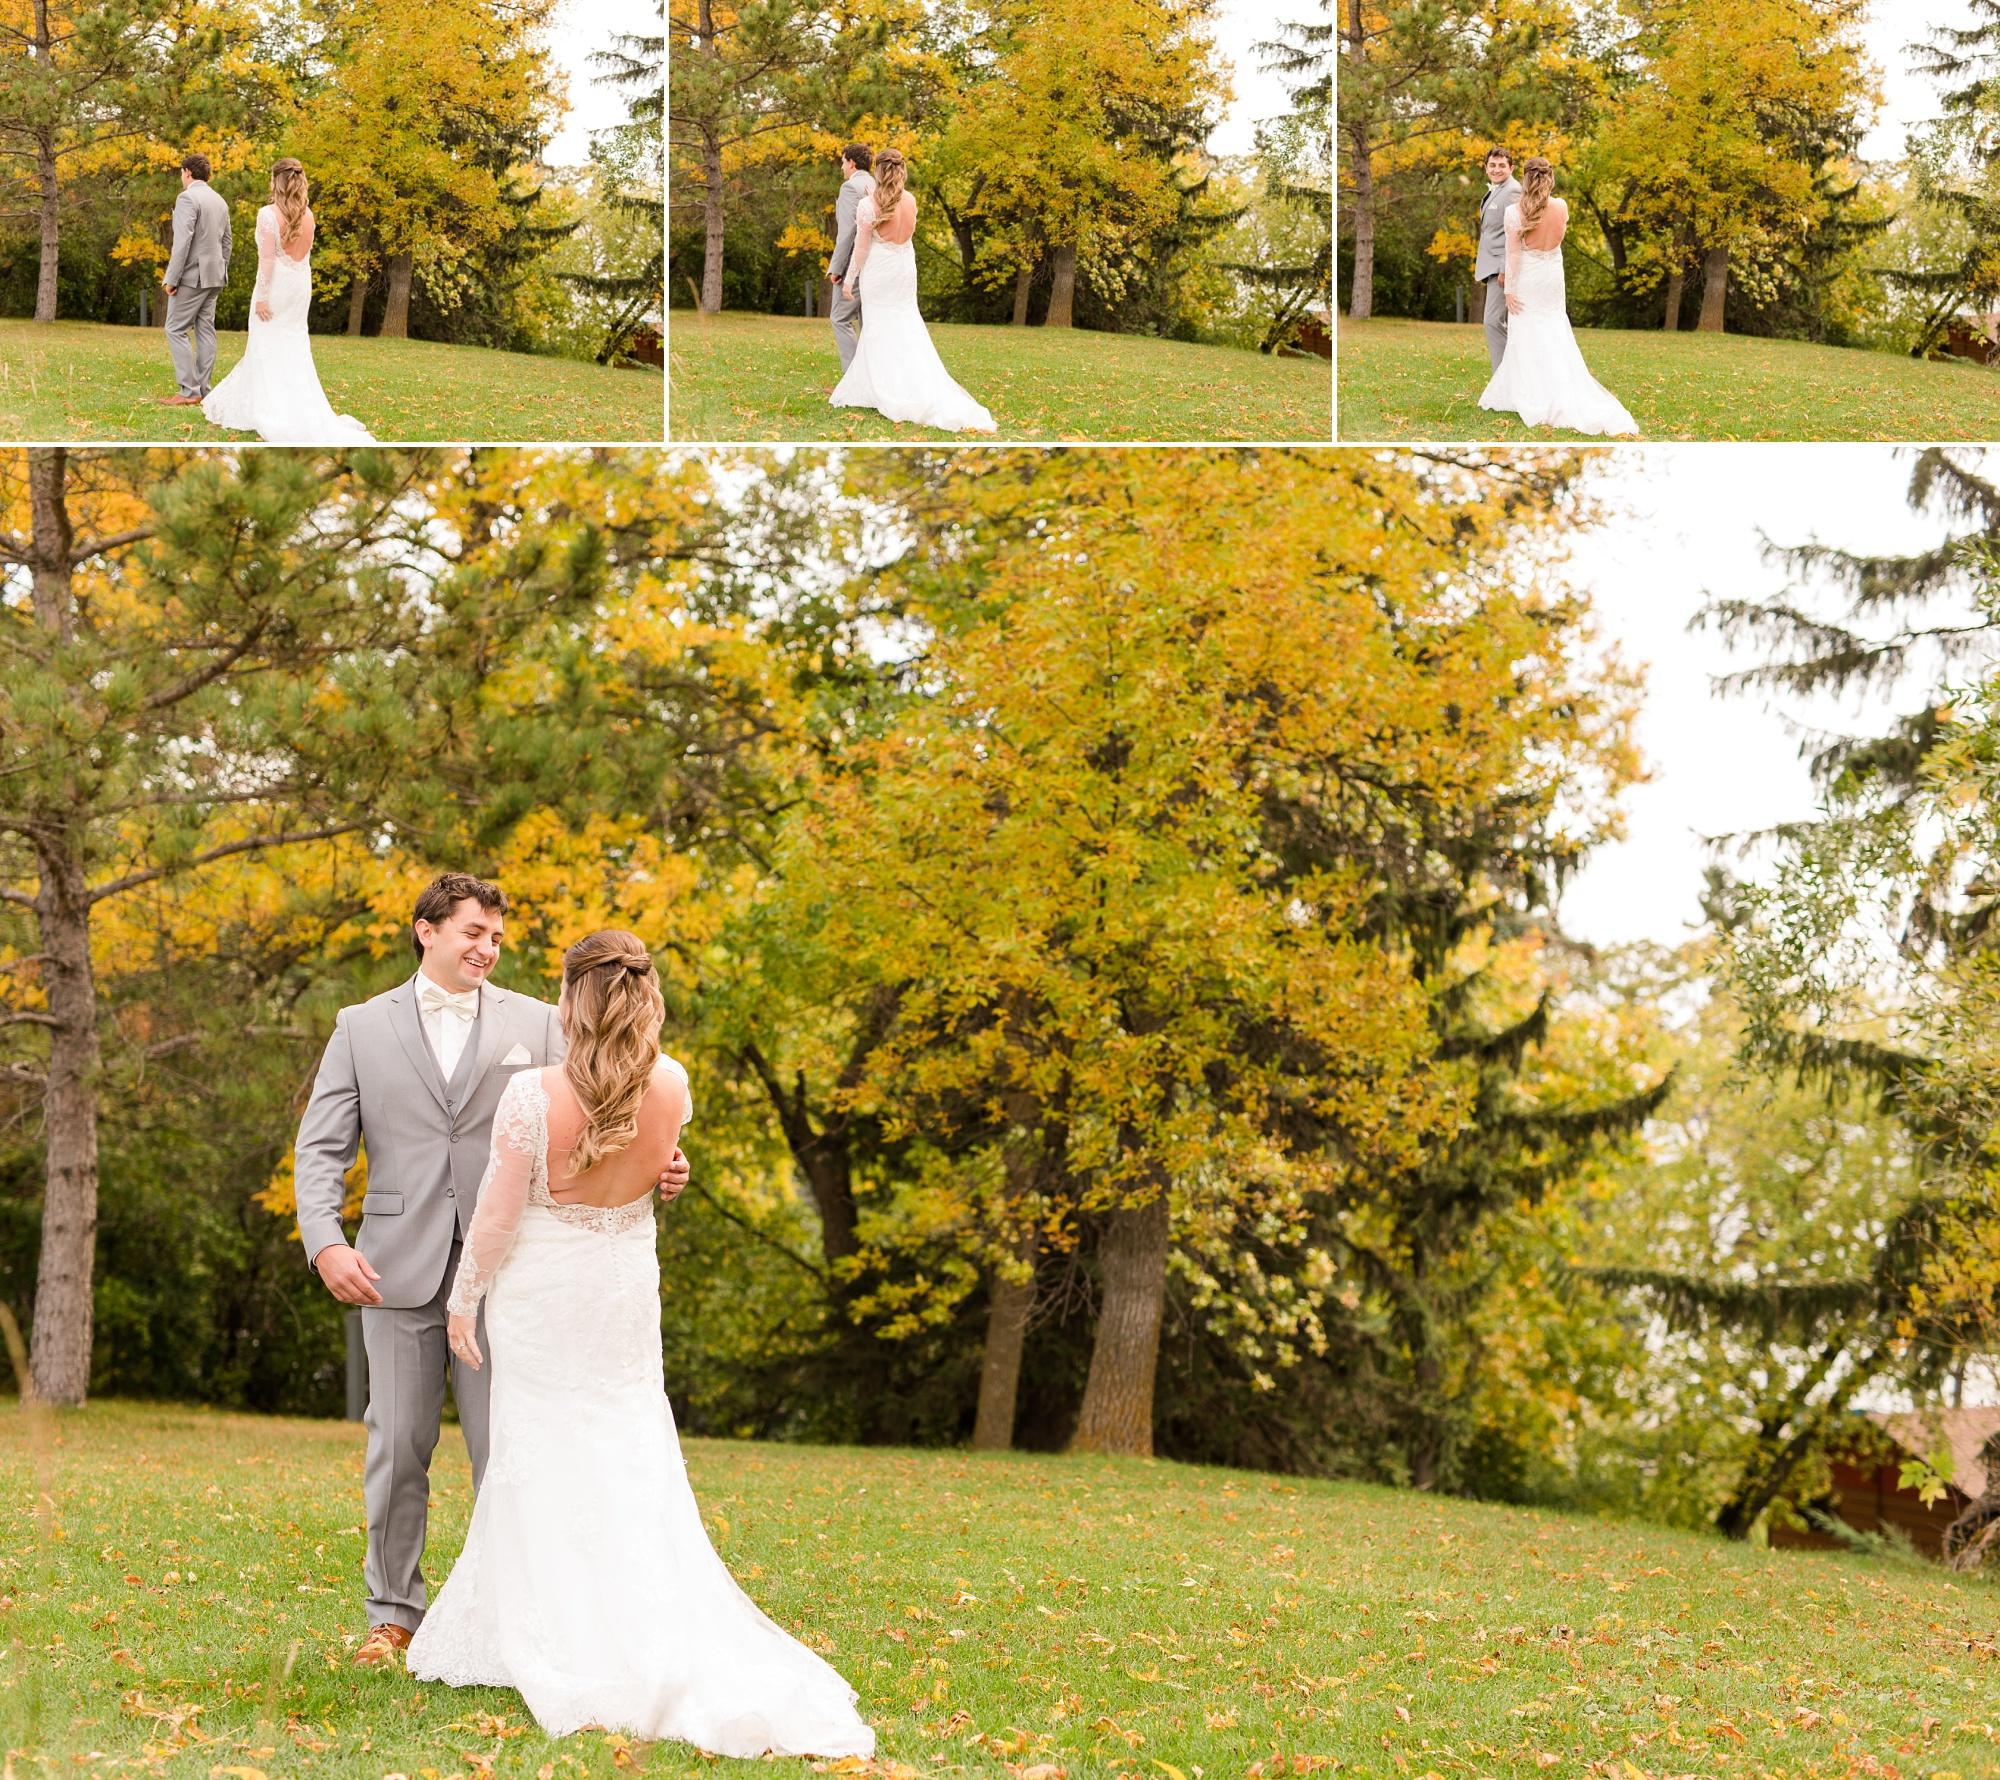 AmberLangerudPhotography_Fair Hills Resort Lakeside Wedding in Minnesota_3419.jpg